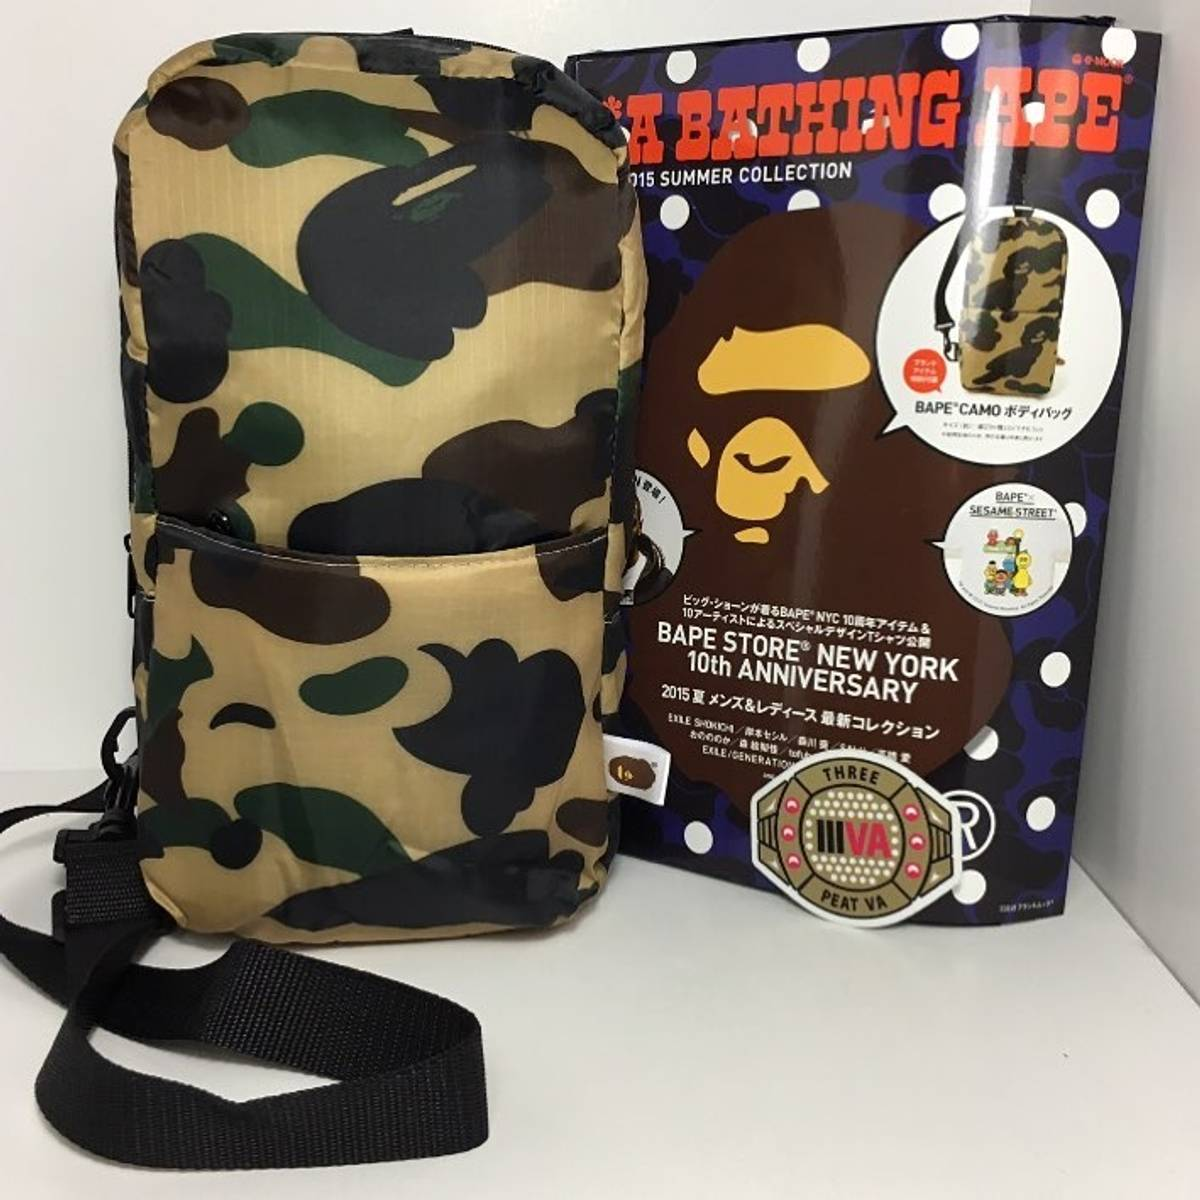 7d12cf17ebce Bape Bape Camo Messenger Bag Size one size - Bags   Luggage for Sale -  Grailed